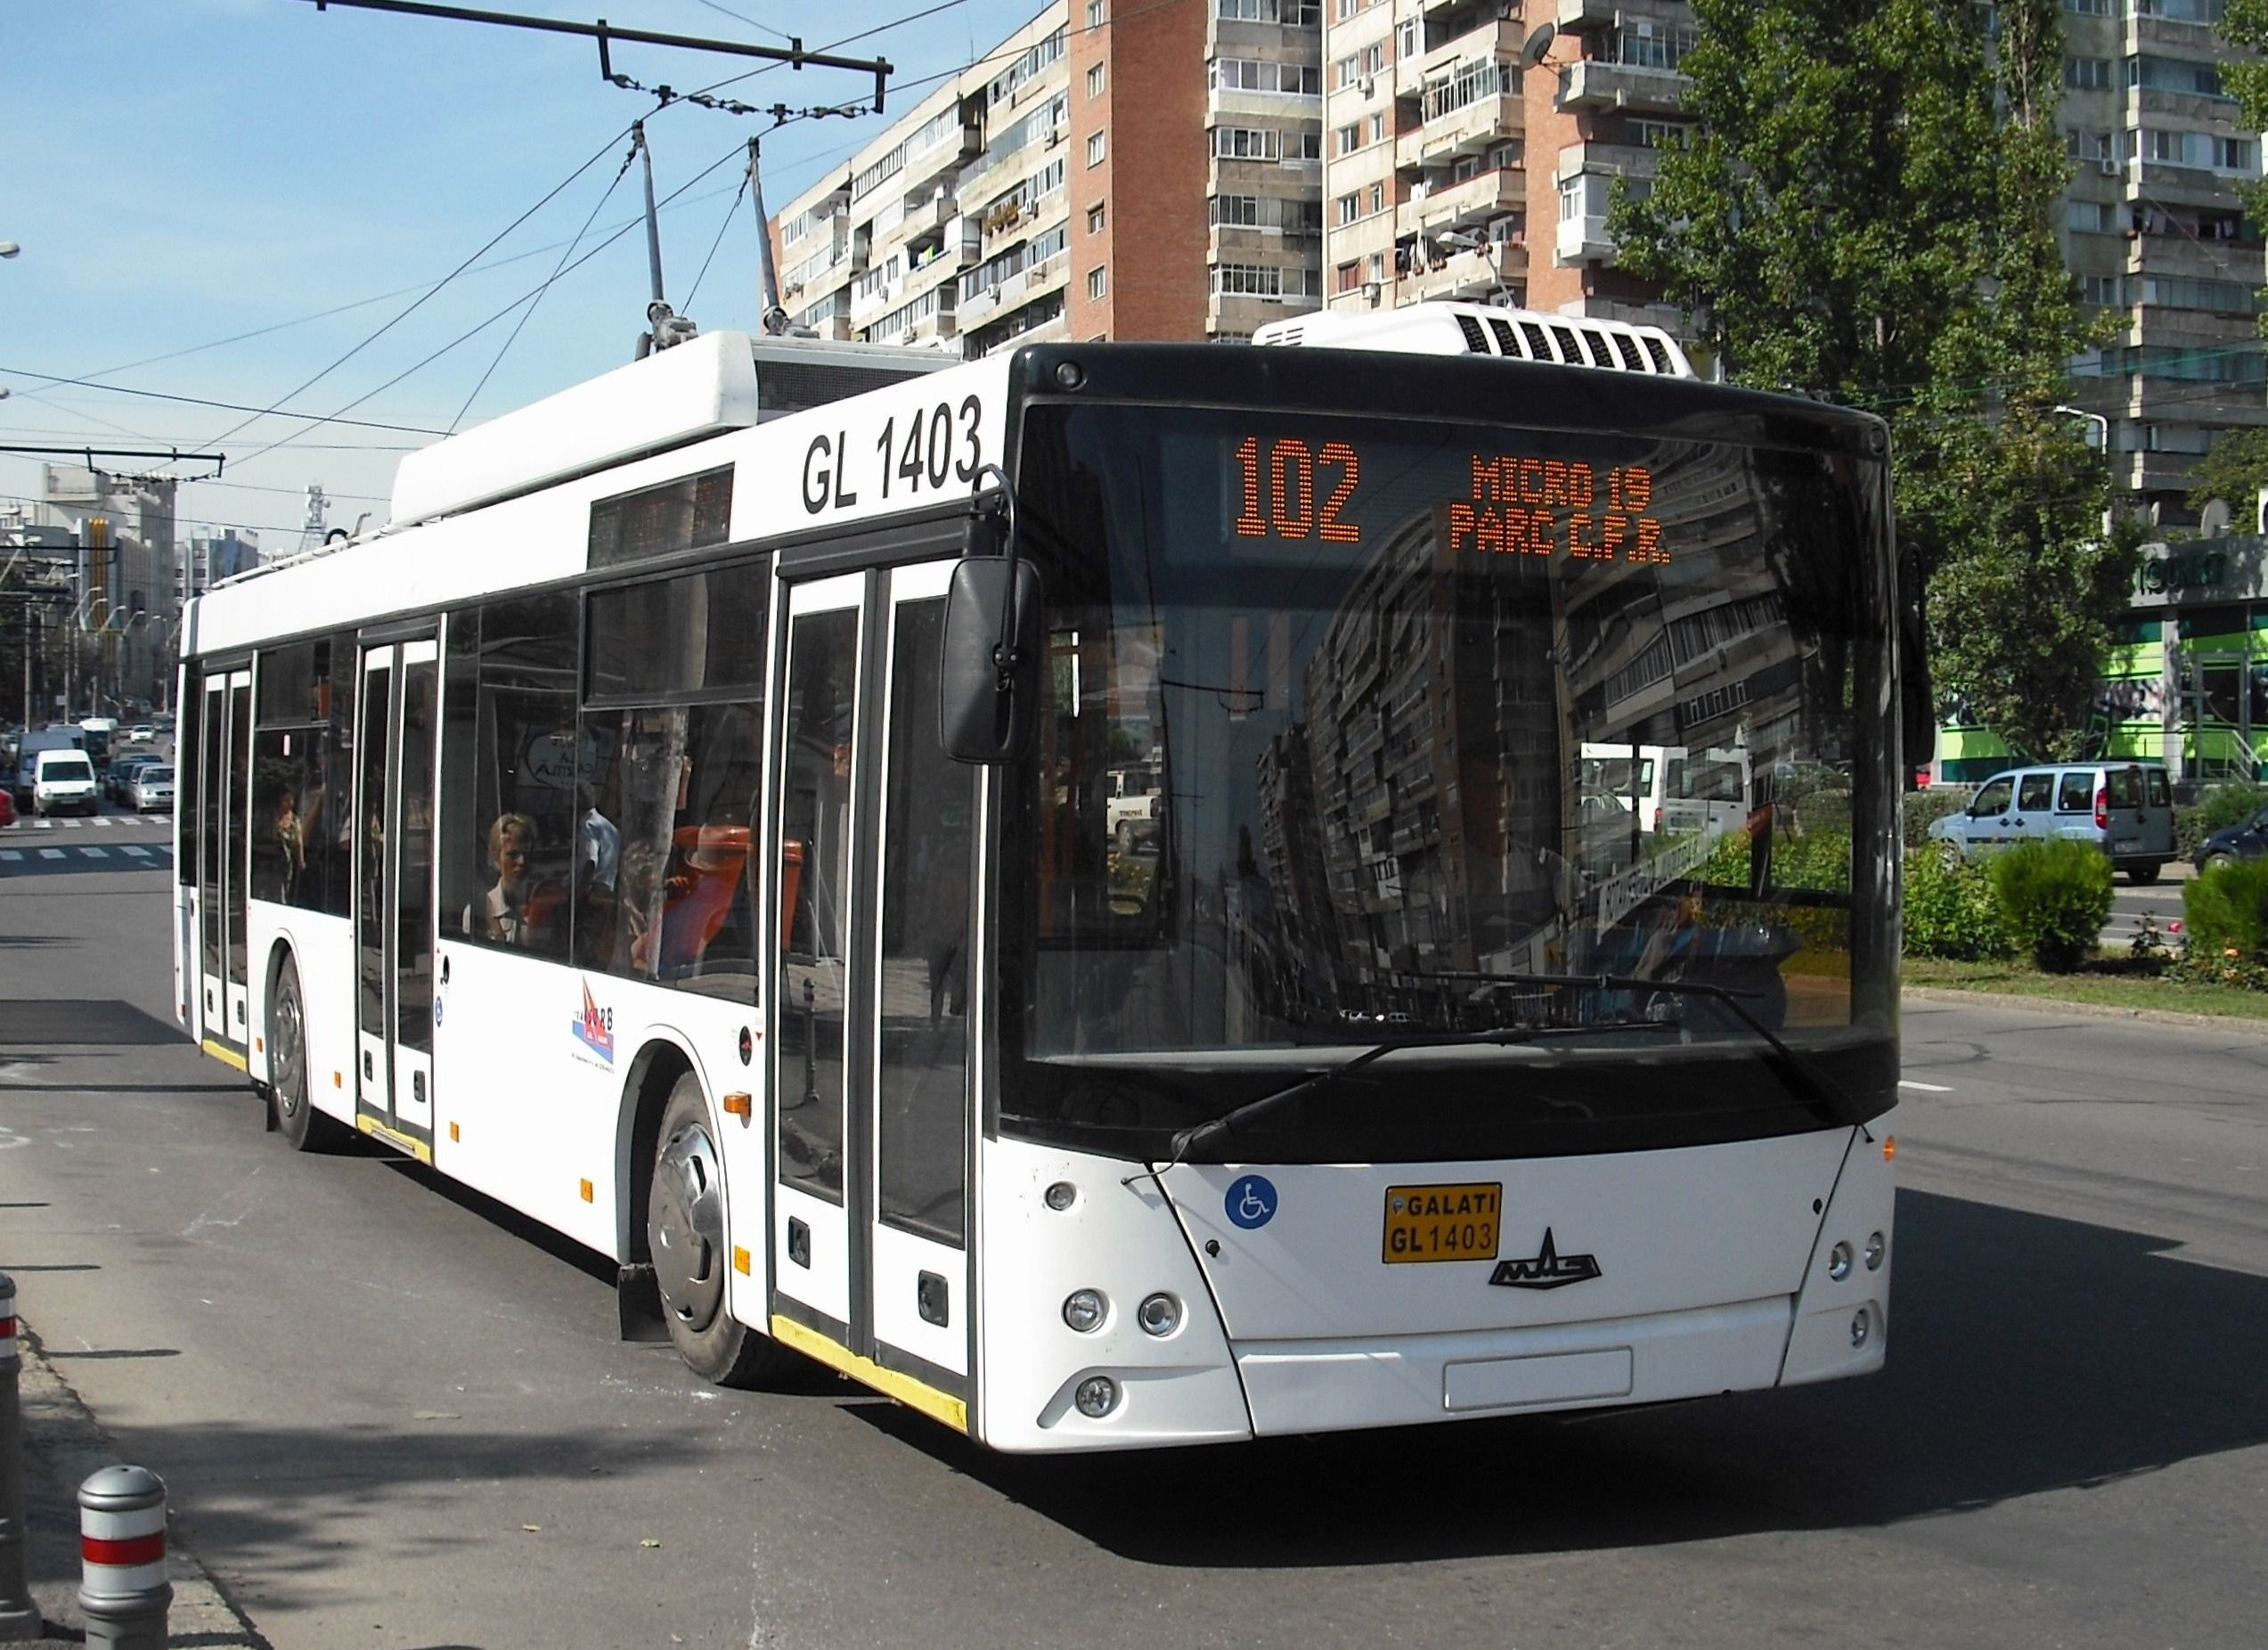 File:Galati MAZ trolleybus 1403.jpg